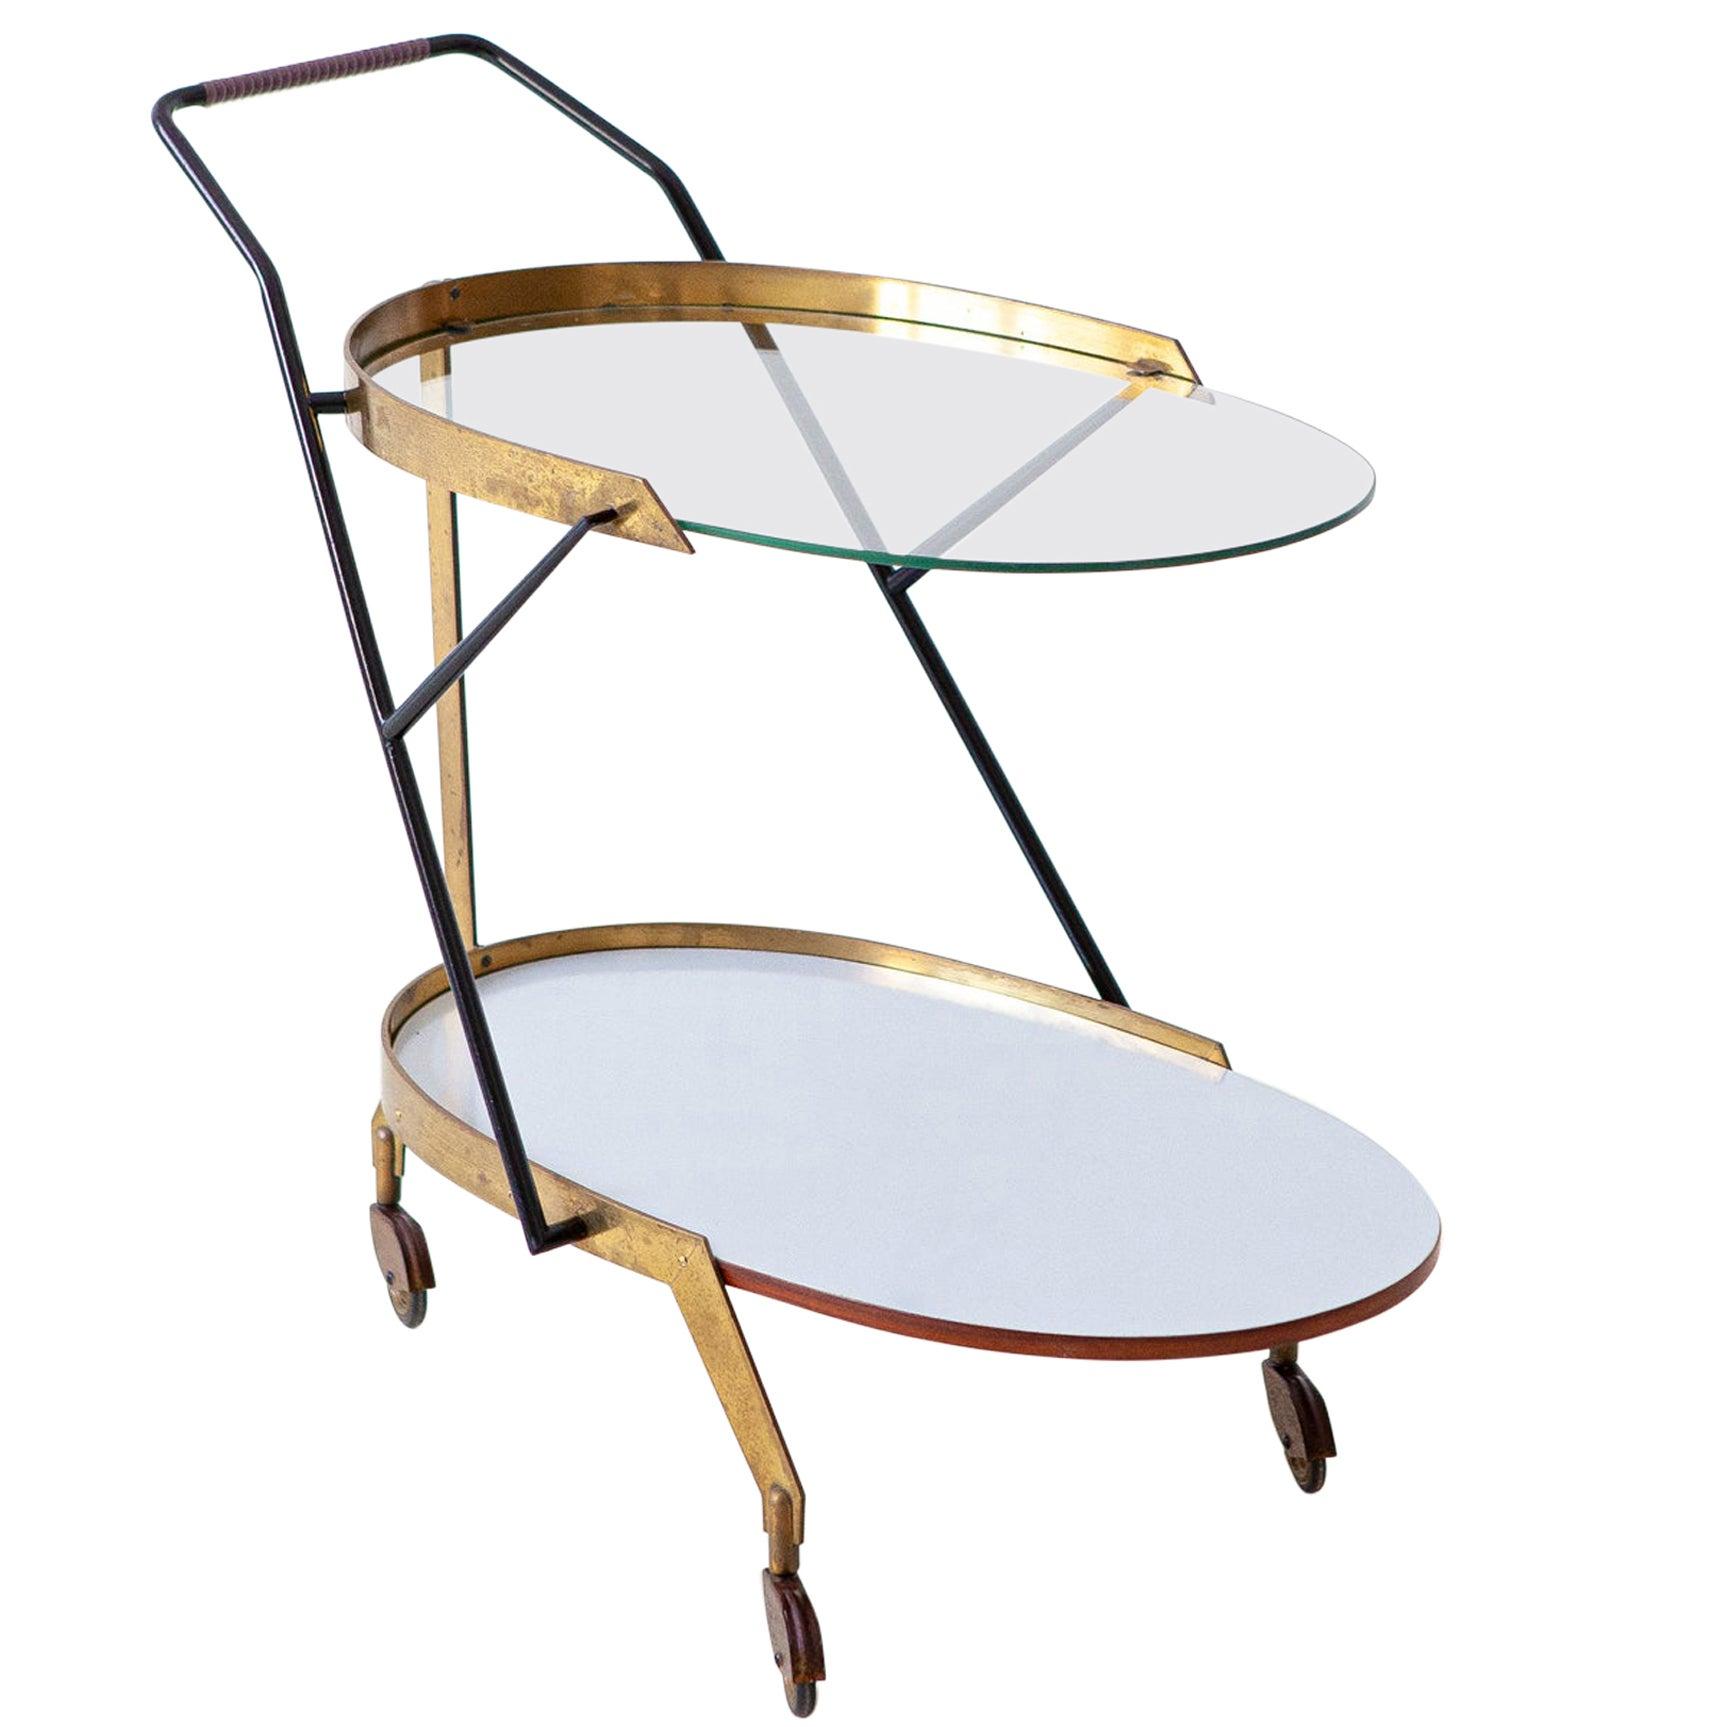 Italian Modern Glass and Brass Bar Cart, 1950s